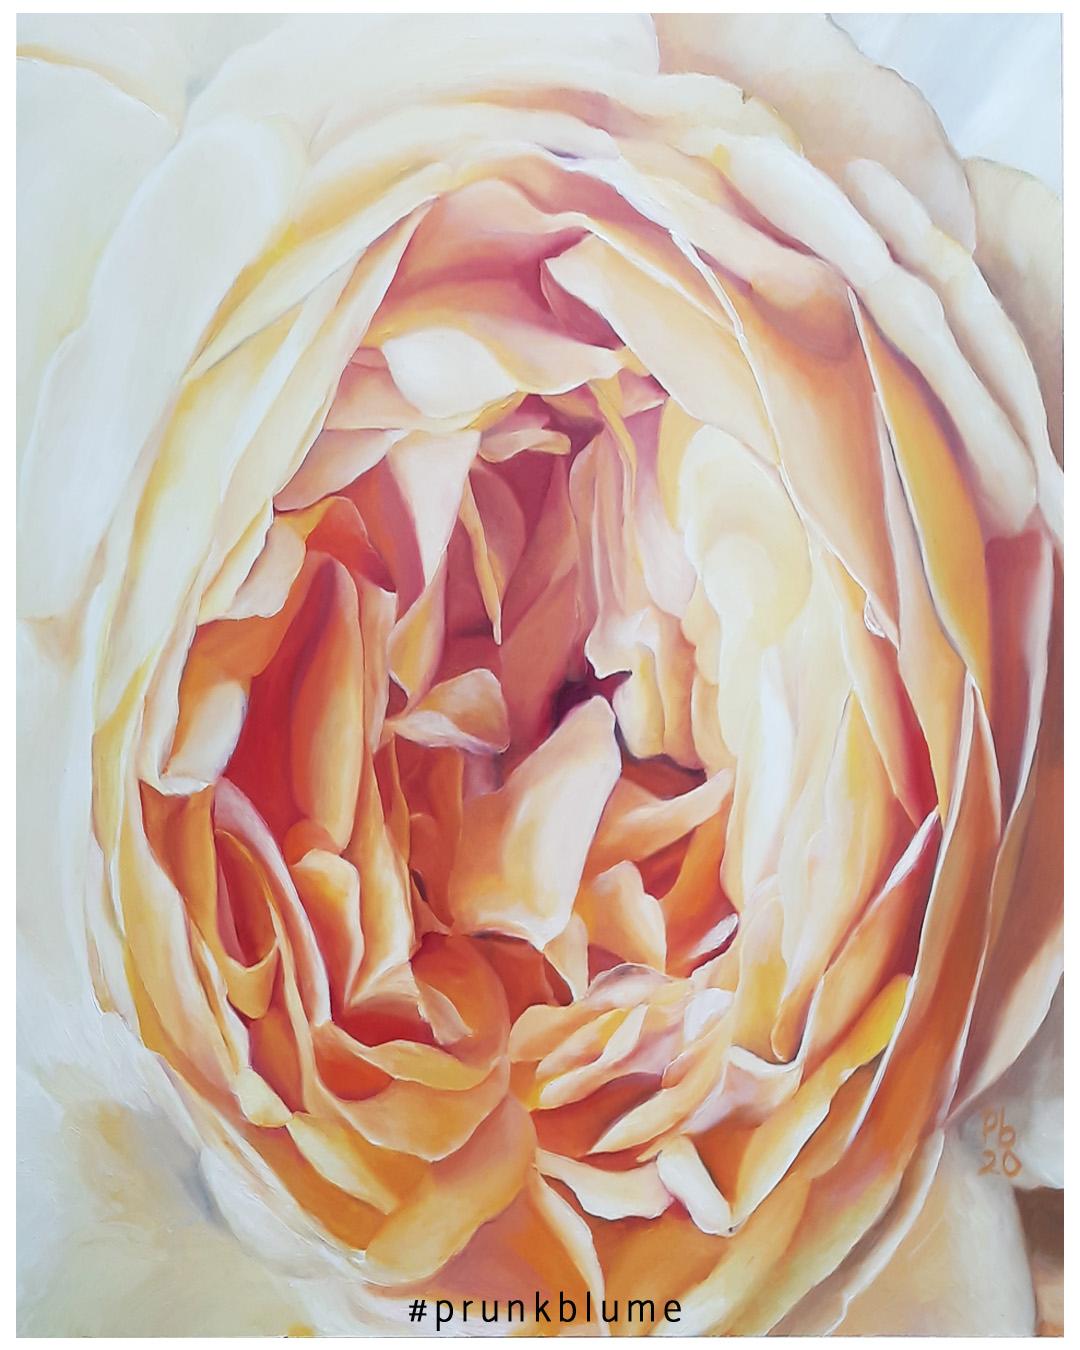 Rosenmalerei, Rosenmalerin, ölmalerei, oilpainting, rose paintings, floral paintings,